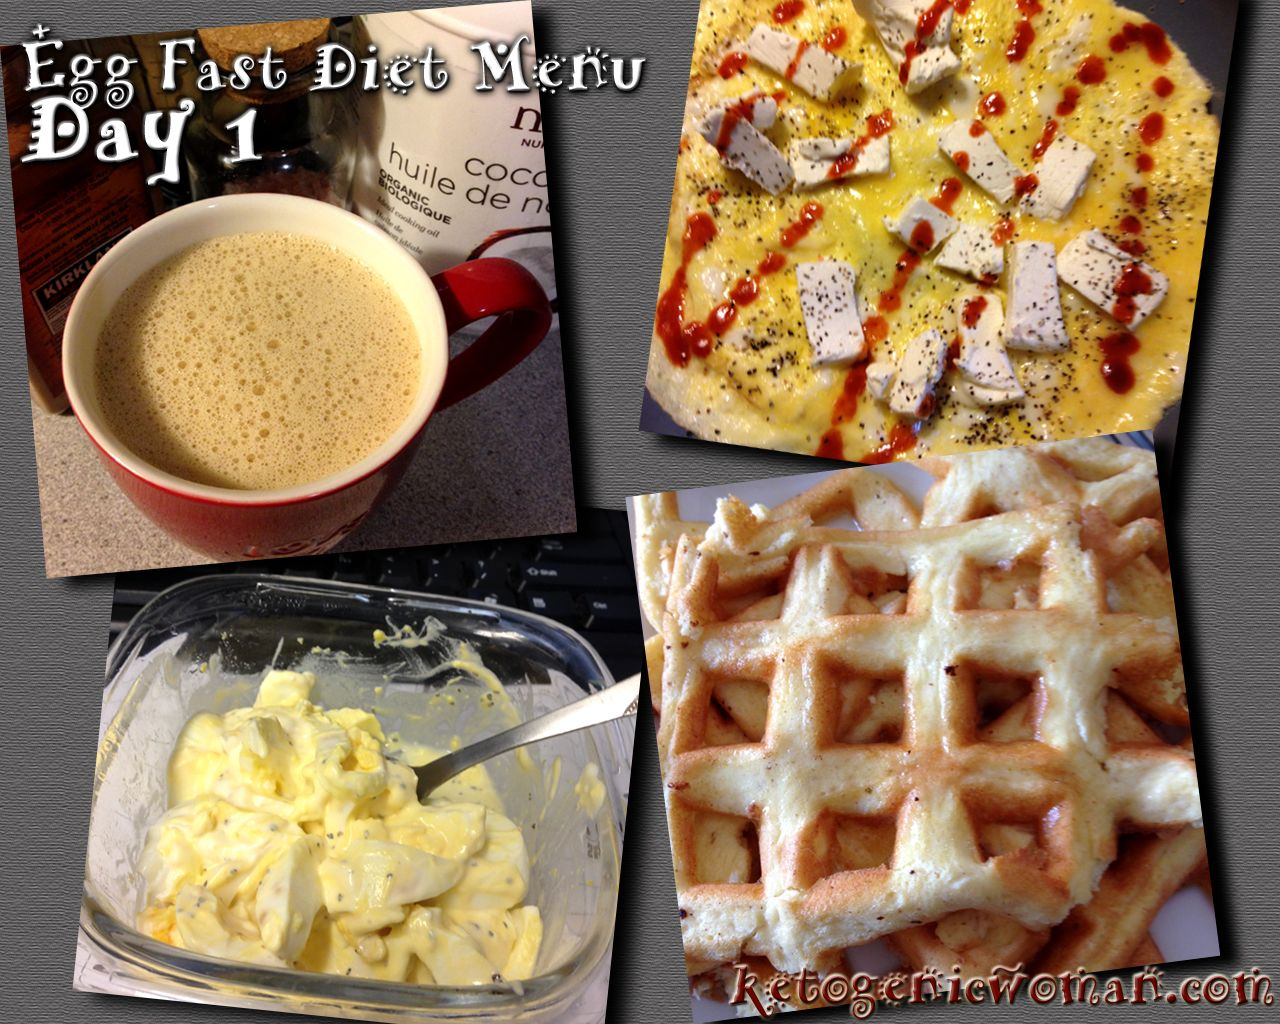 Day 1 Of The Egg Fast Diet Menu Plan #eggfast #keto